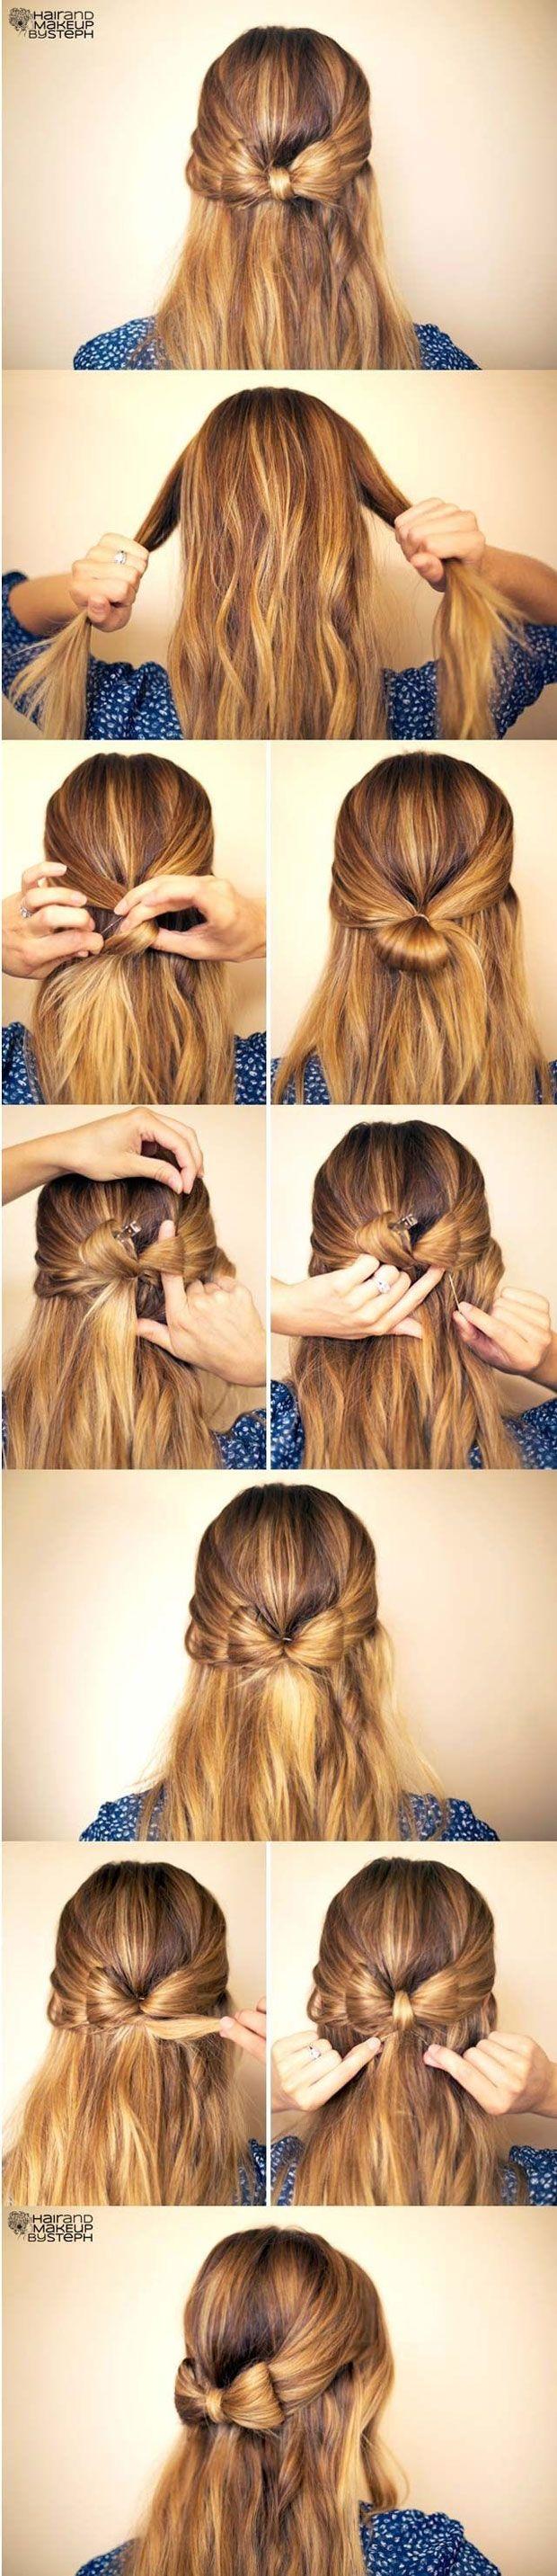 half-up-bow-hairl-pinterest-hair-tutorial